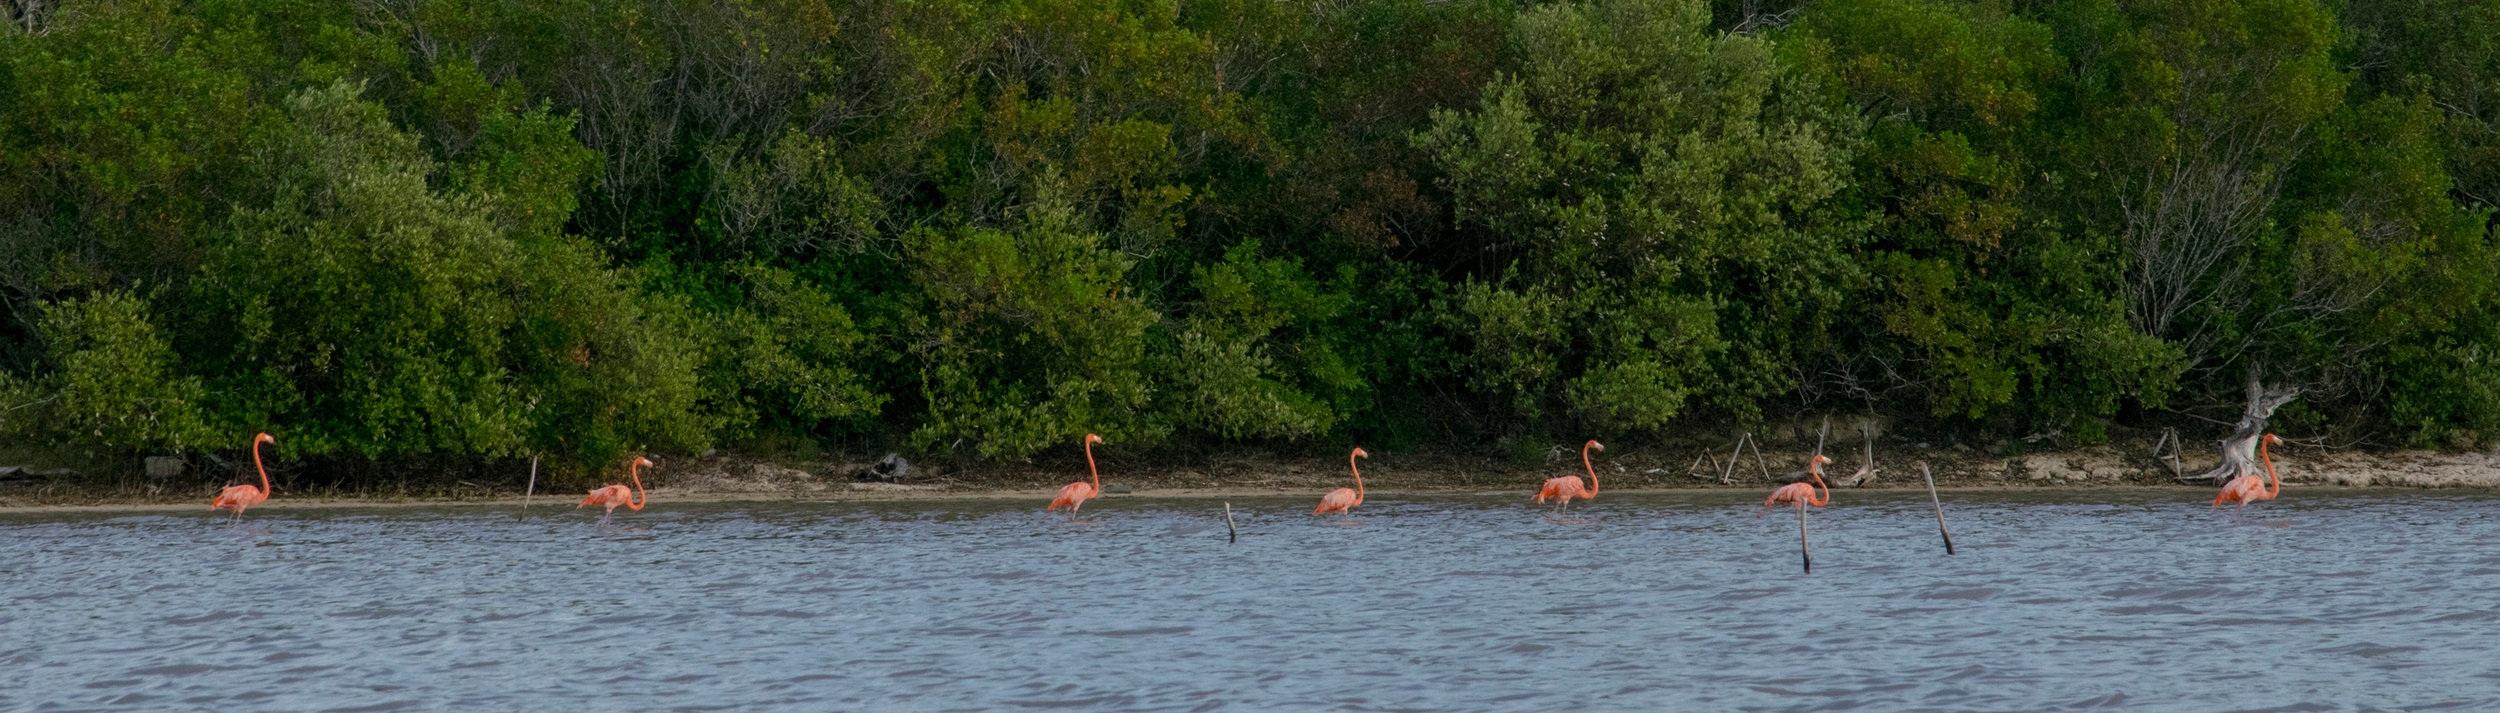 Flamingos in the Celestun Biosphere Reserve